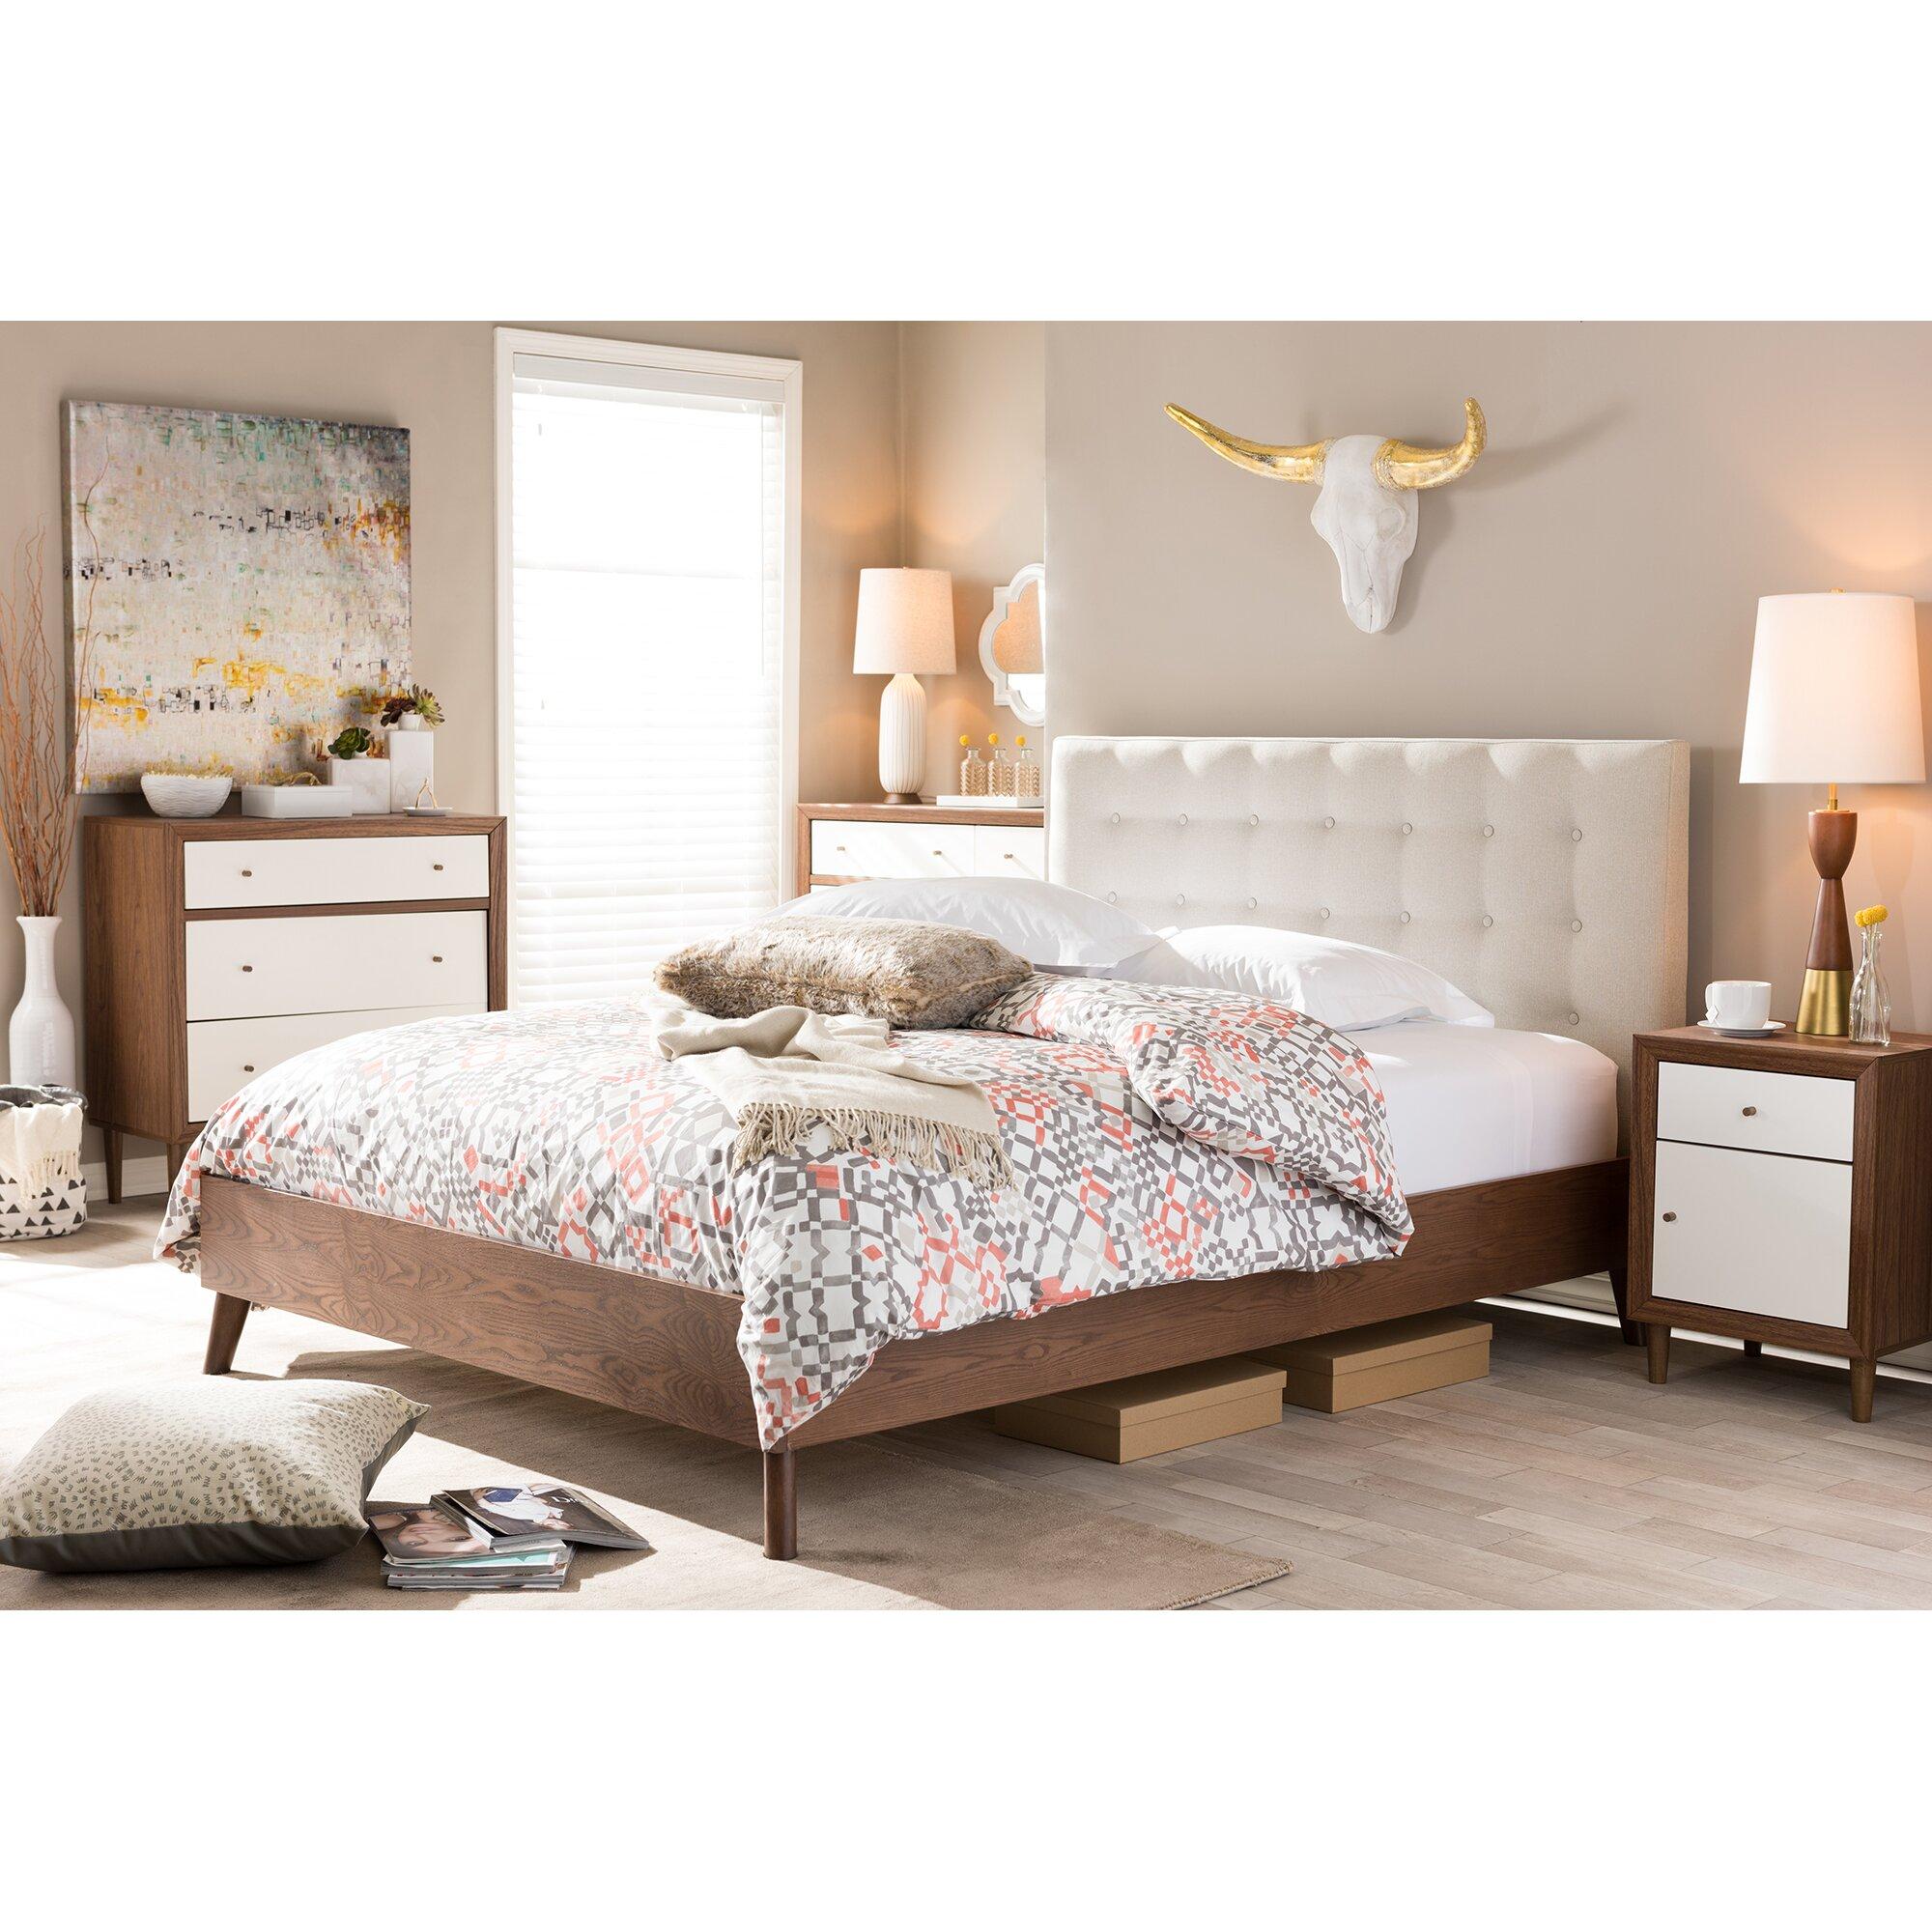 Wholesale interiors baxton studio upholstered platform bed for Upholstered full bed